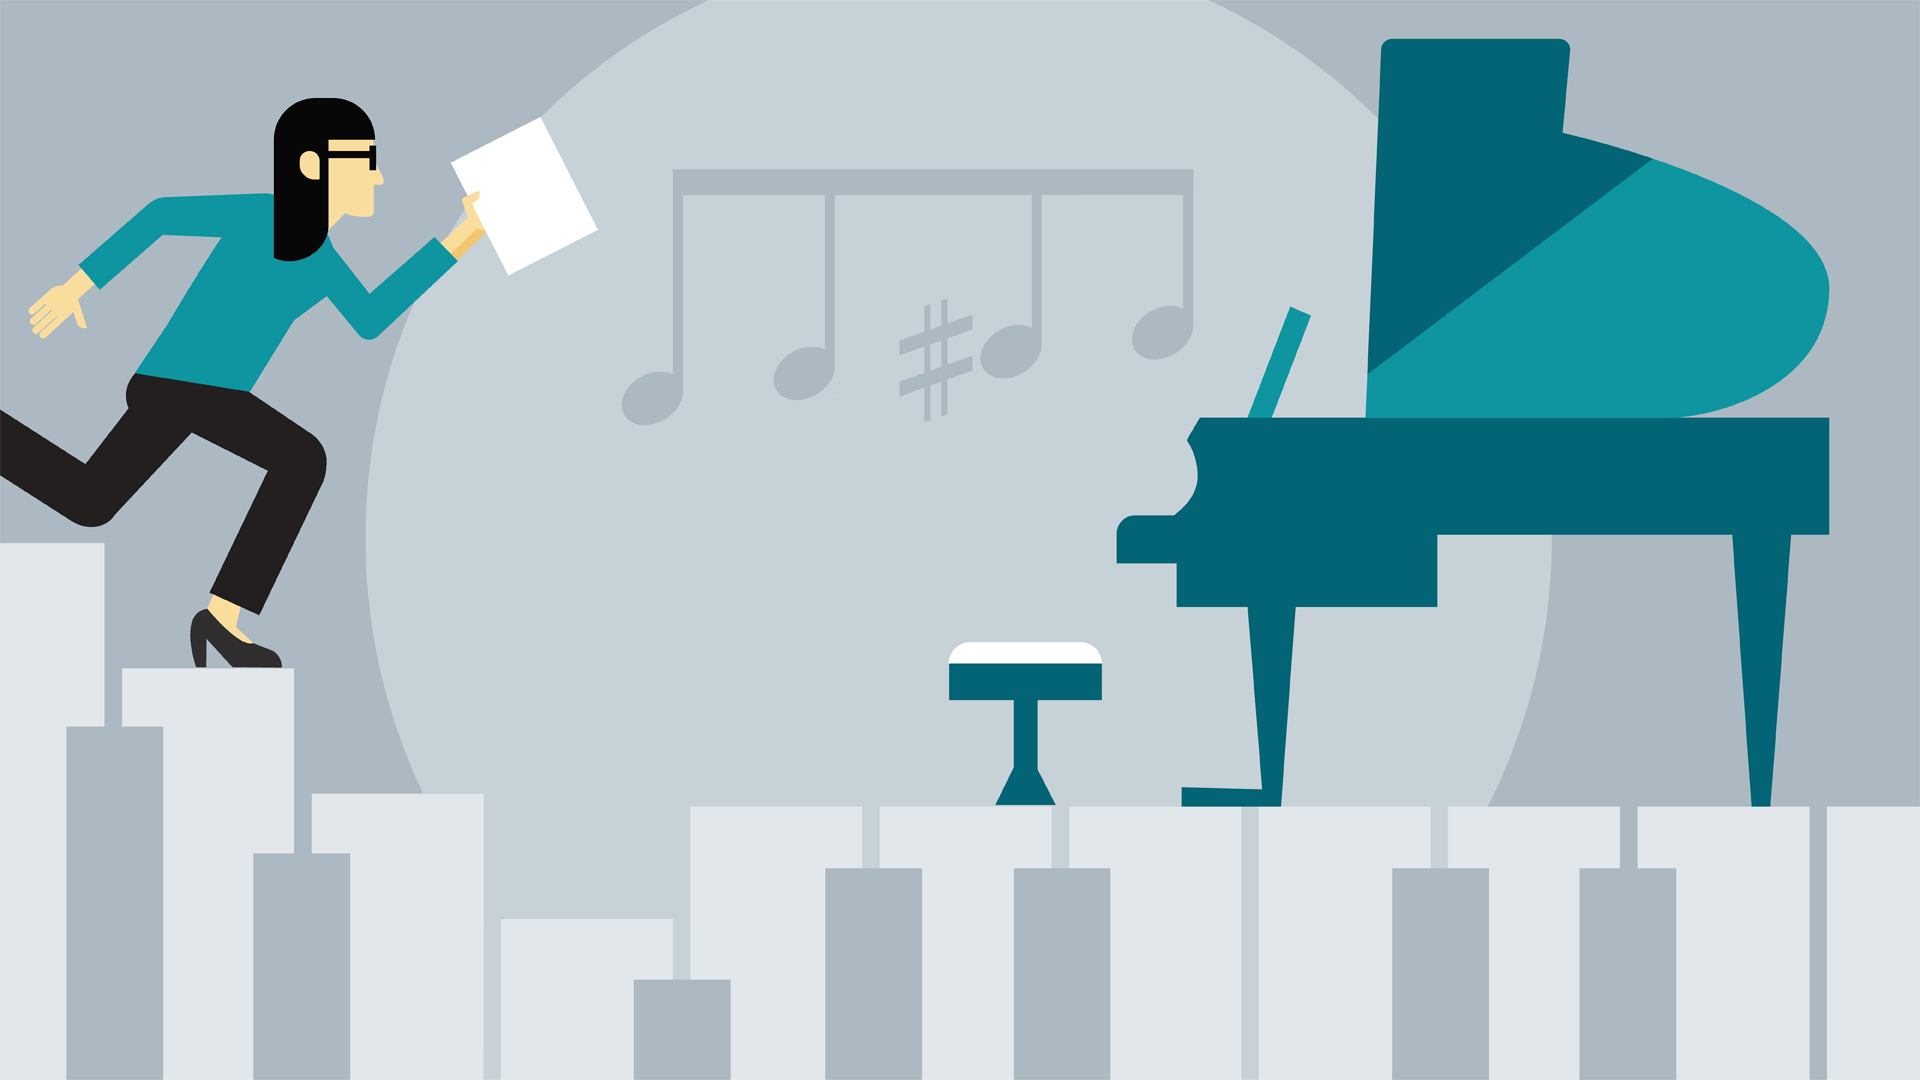 Illustration of piano and piano player walking across piano keys